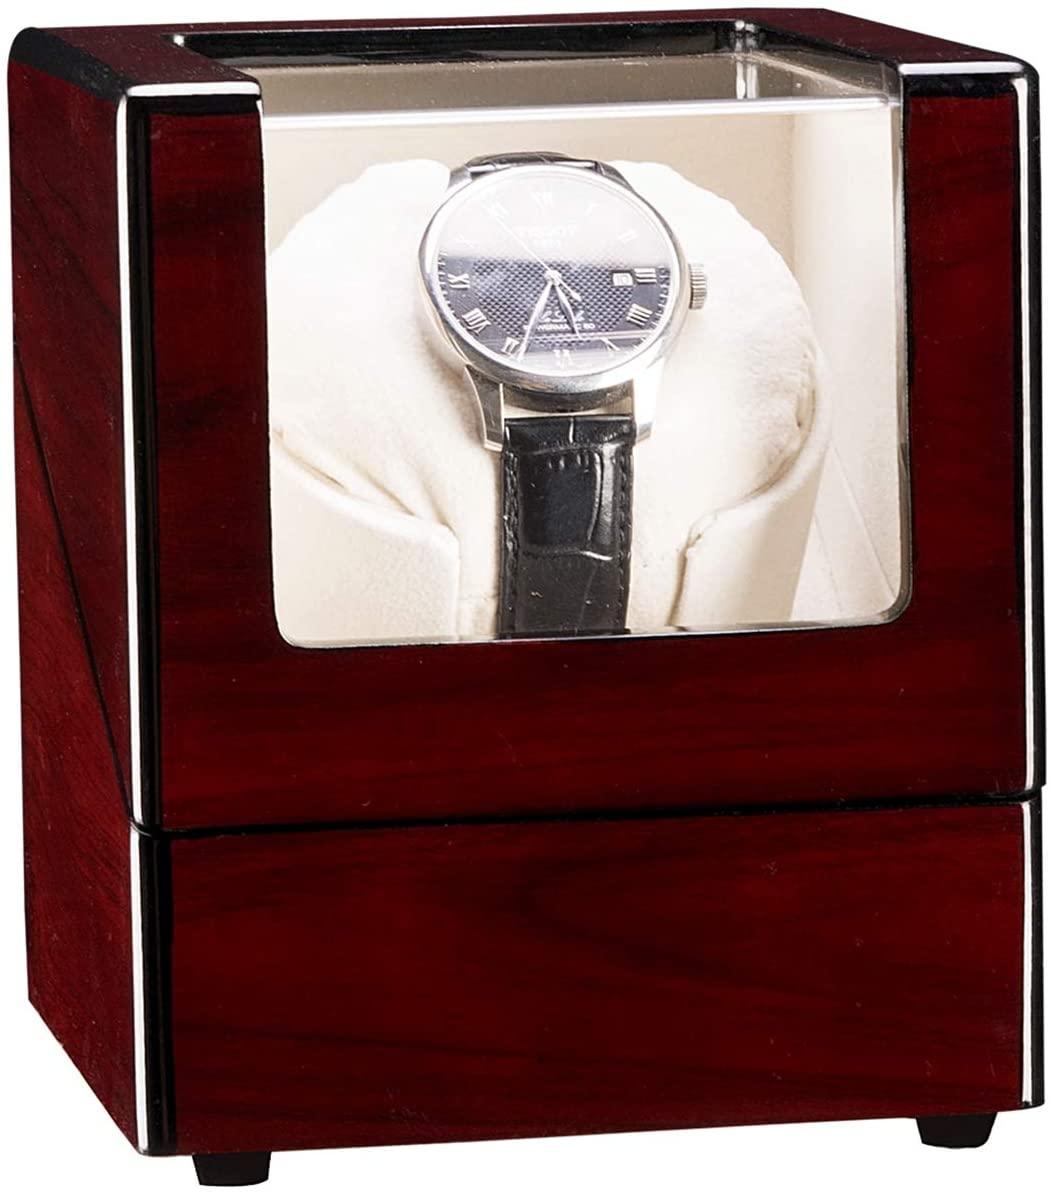 IHADA Single Watch Winder Automatic Rotation Wood Display Case Storage OrganizerSandalwood Red(Appearance) White(Internal Modern Watch Box, Watch Case Organizer for Storage and Display